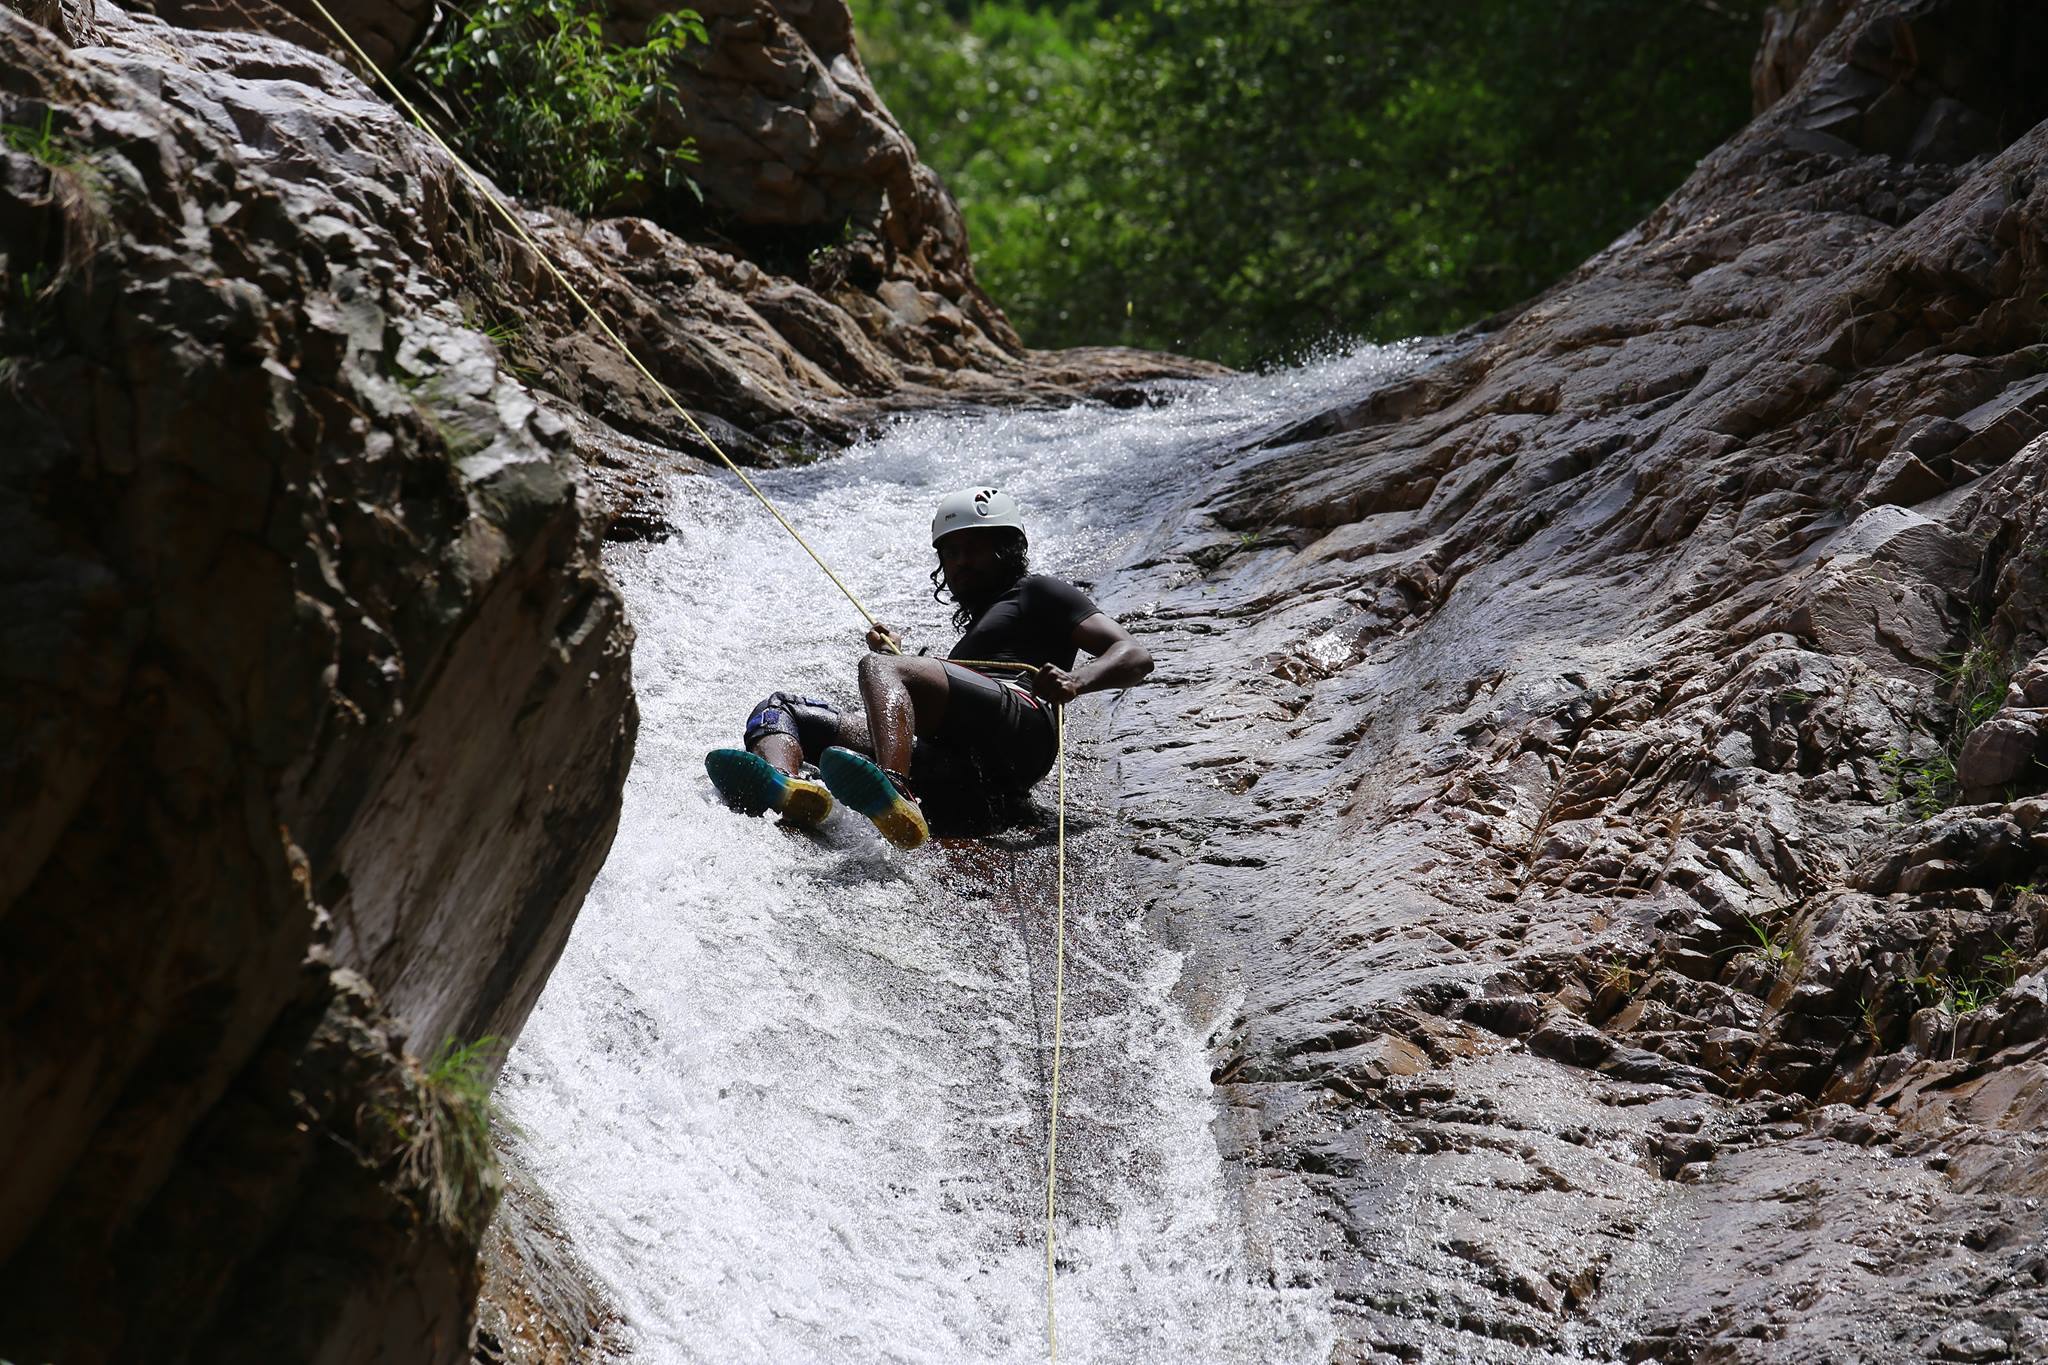 Pravin Kumar - Sliding rappel in Nagalapuram Canyon